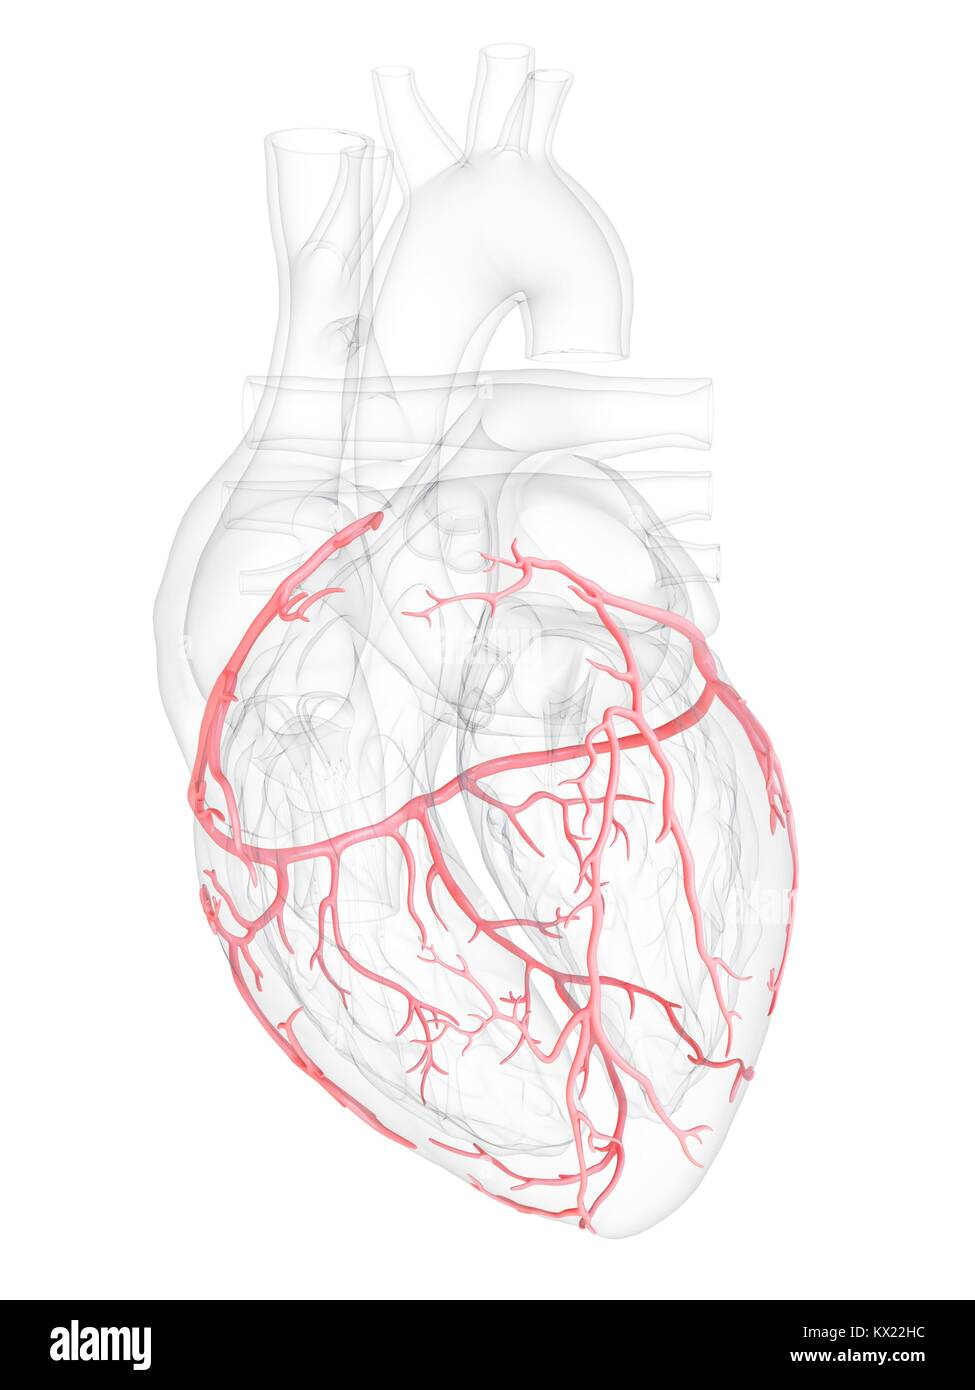 Coronary Arteries Stock Photos & Coronary Arteries Stock Images - Alamy